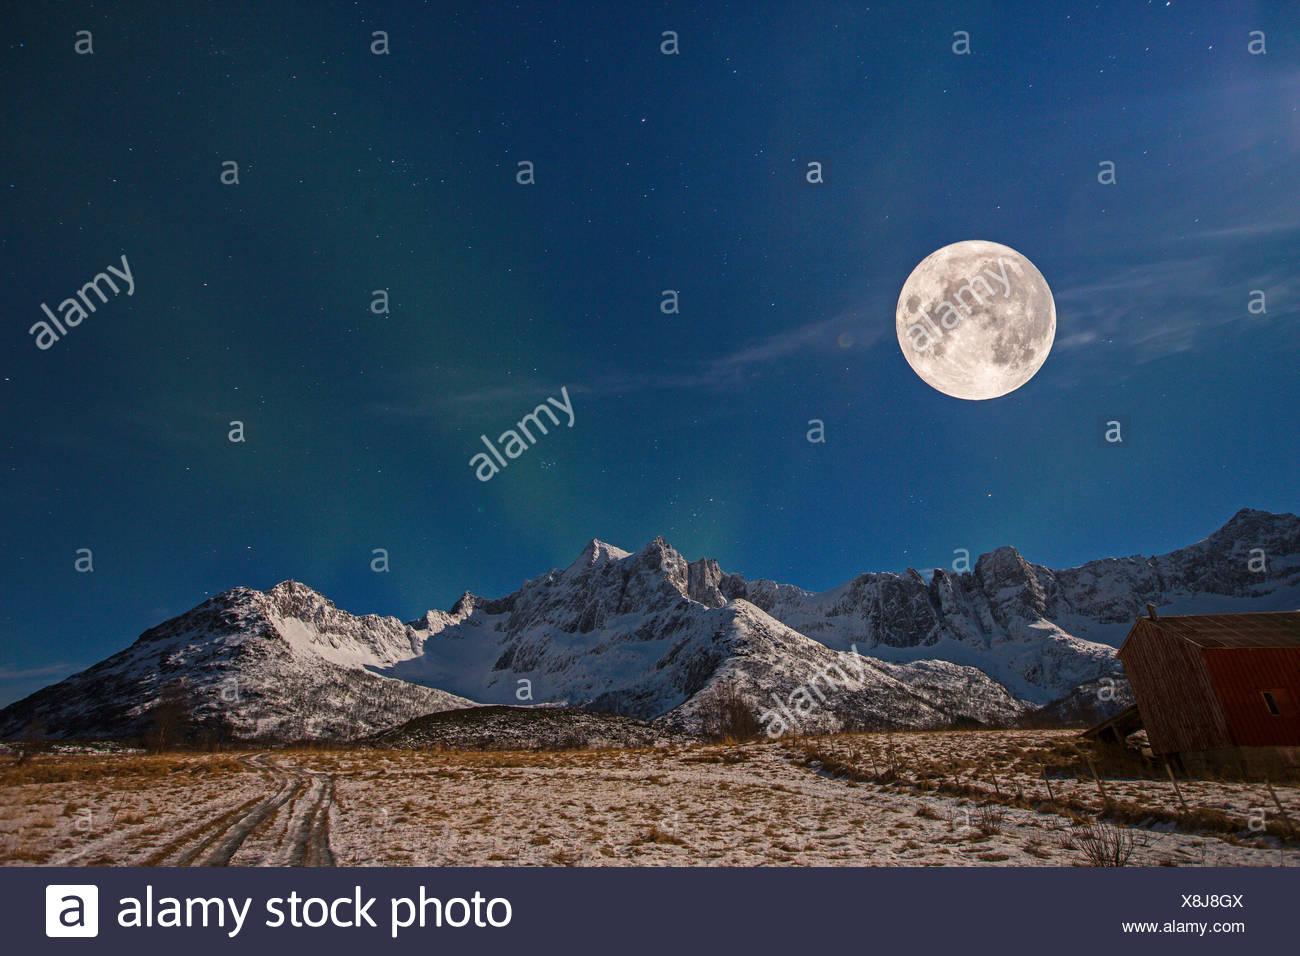 Vollmond mit Sternenhimmel und Nordlicht ueber Bergkette, Norwegen, Troms, Senja   full moon with starry sky and polar light ove - Stock Image